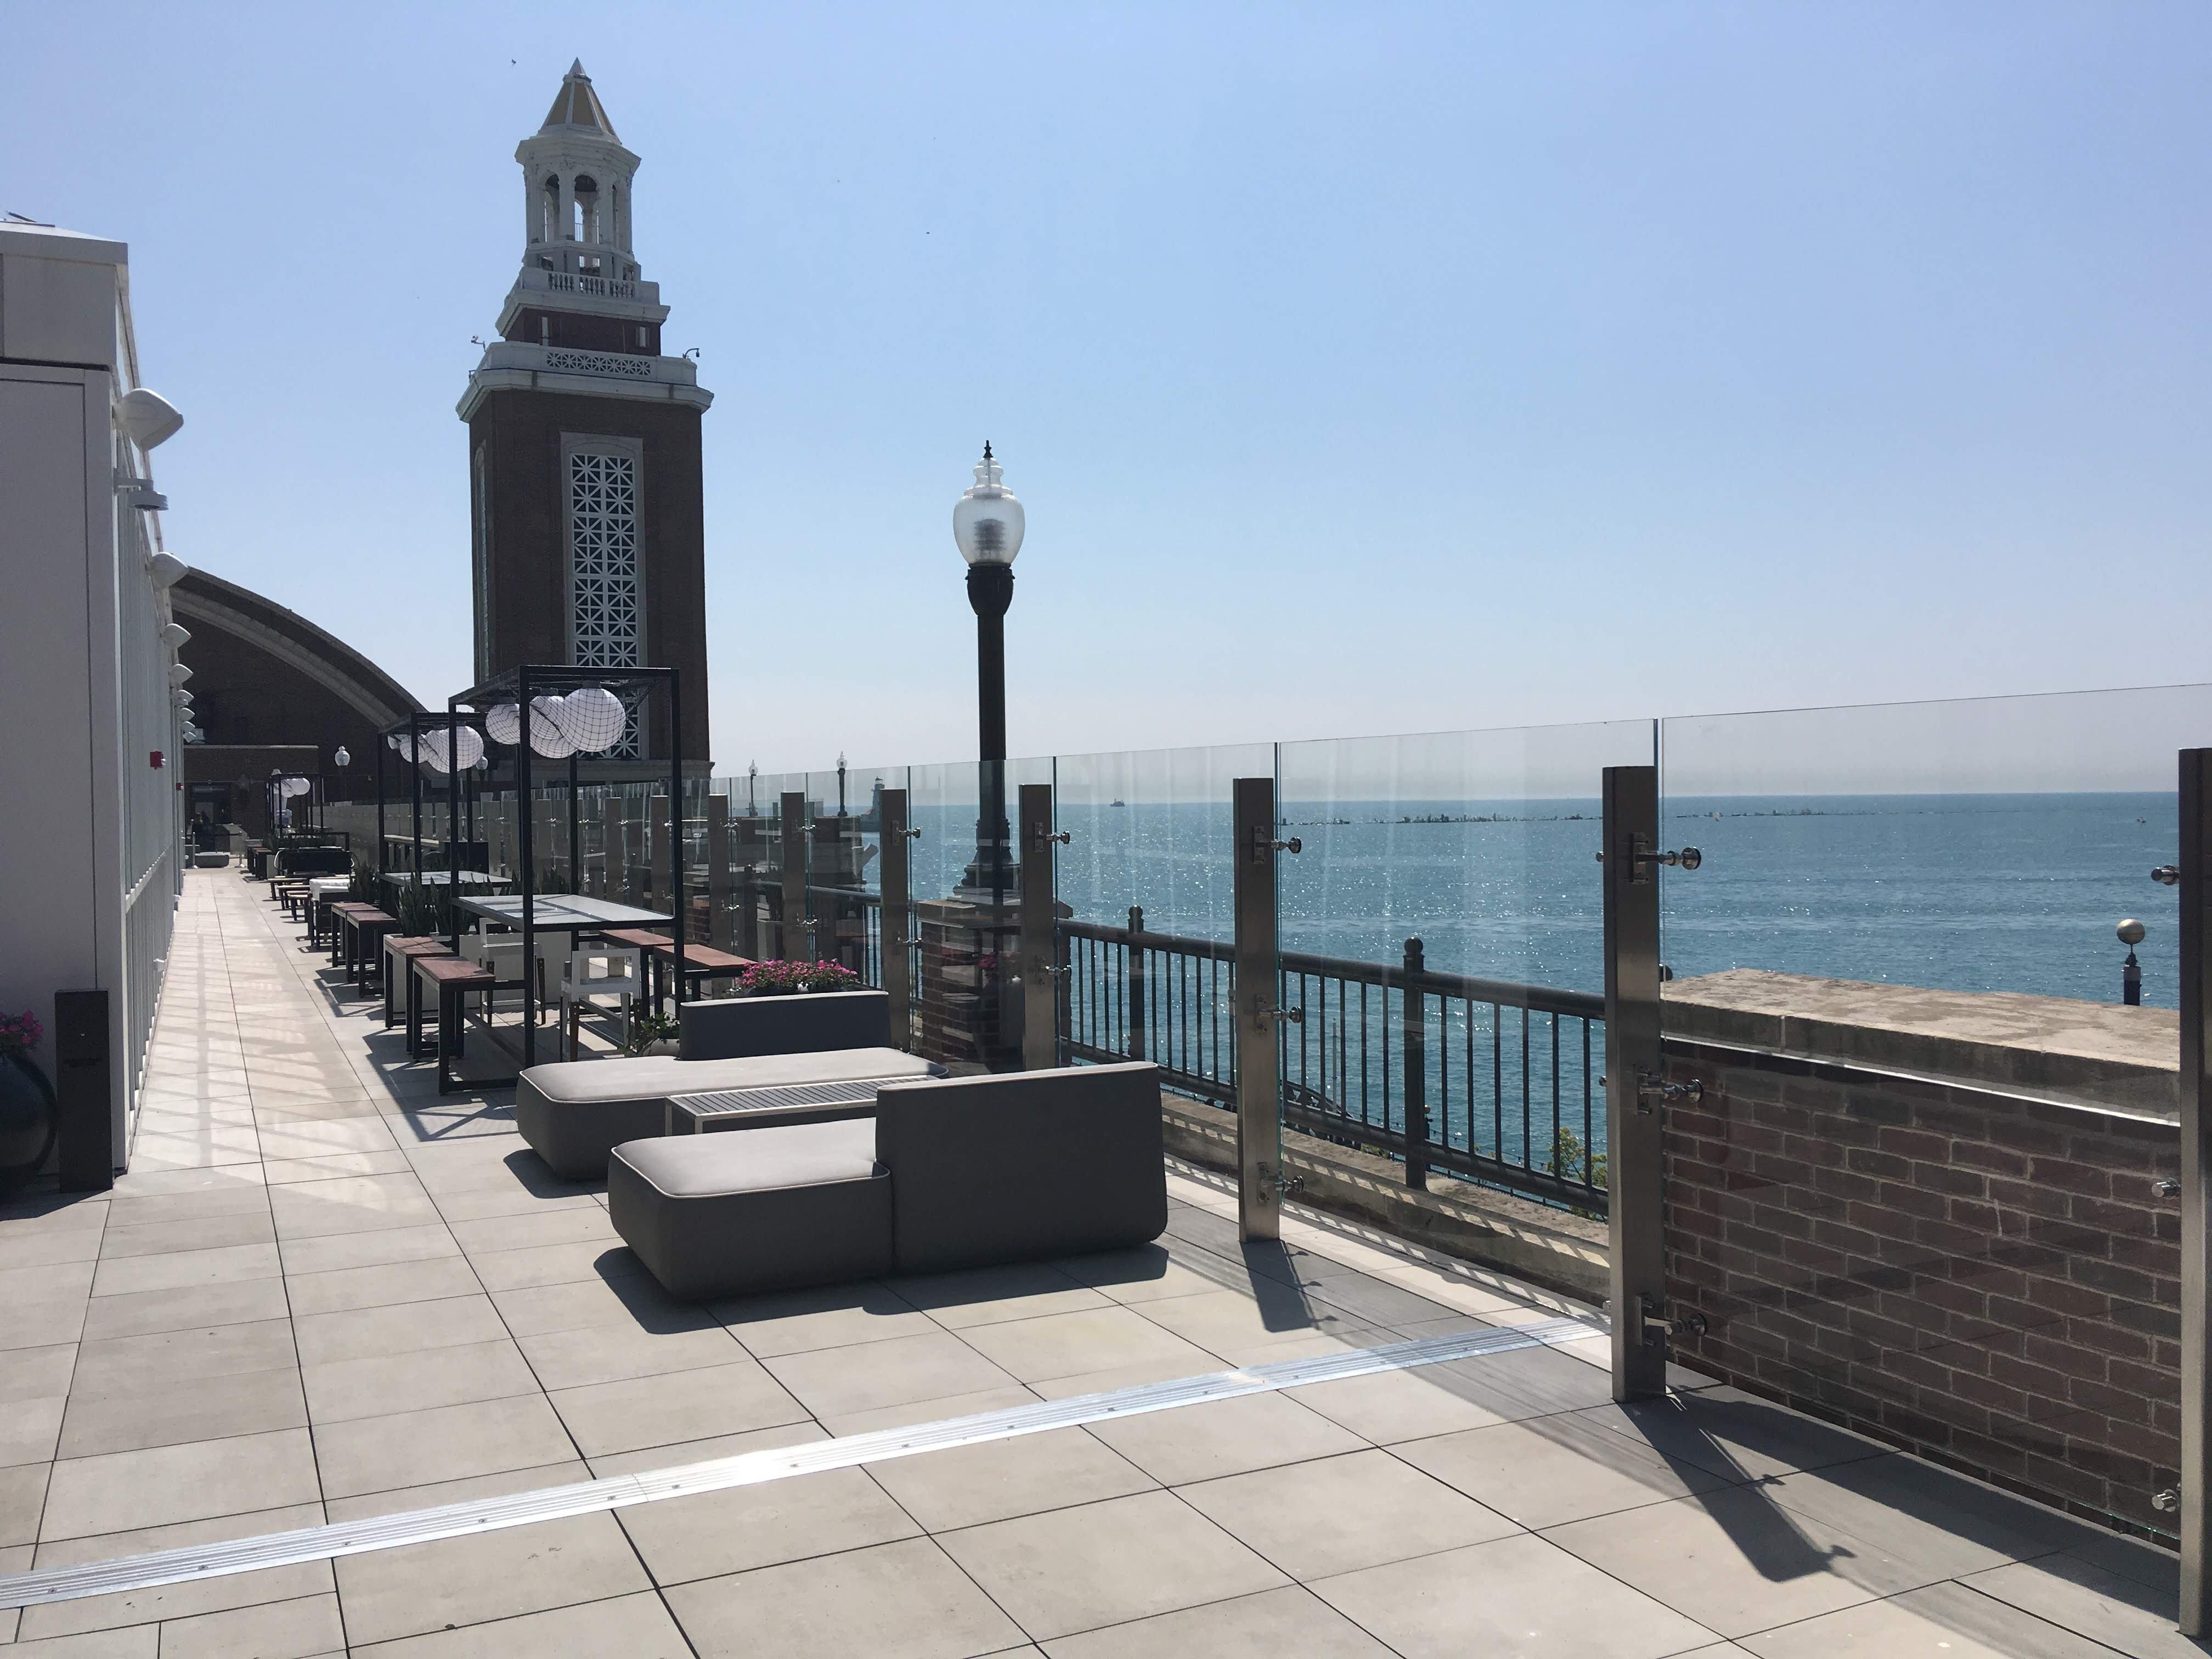 Archatrak Navy Pier 1